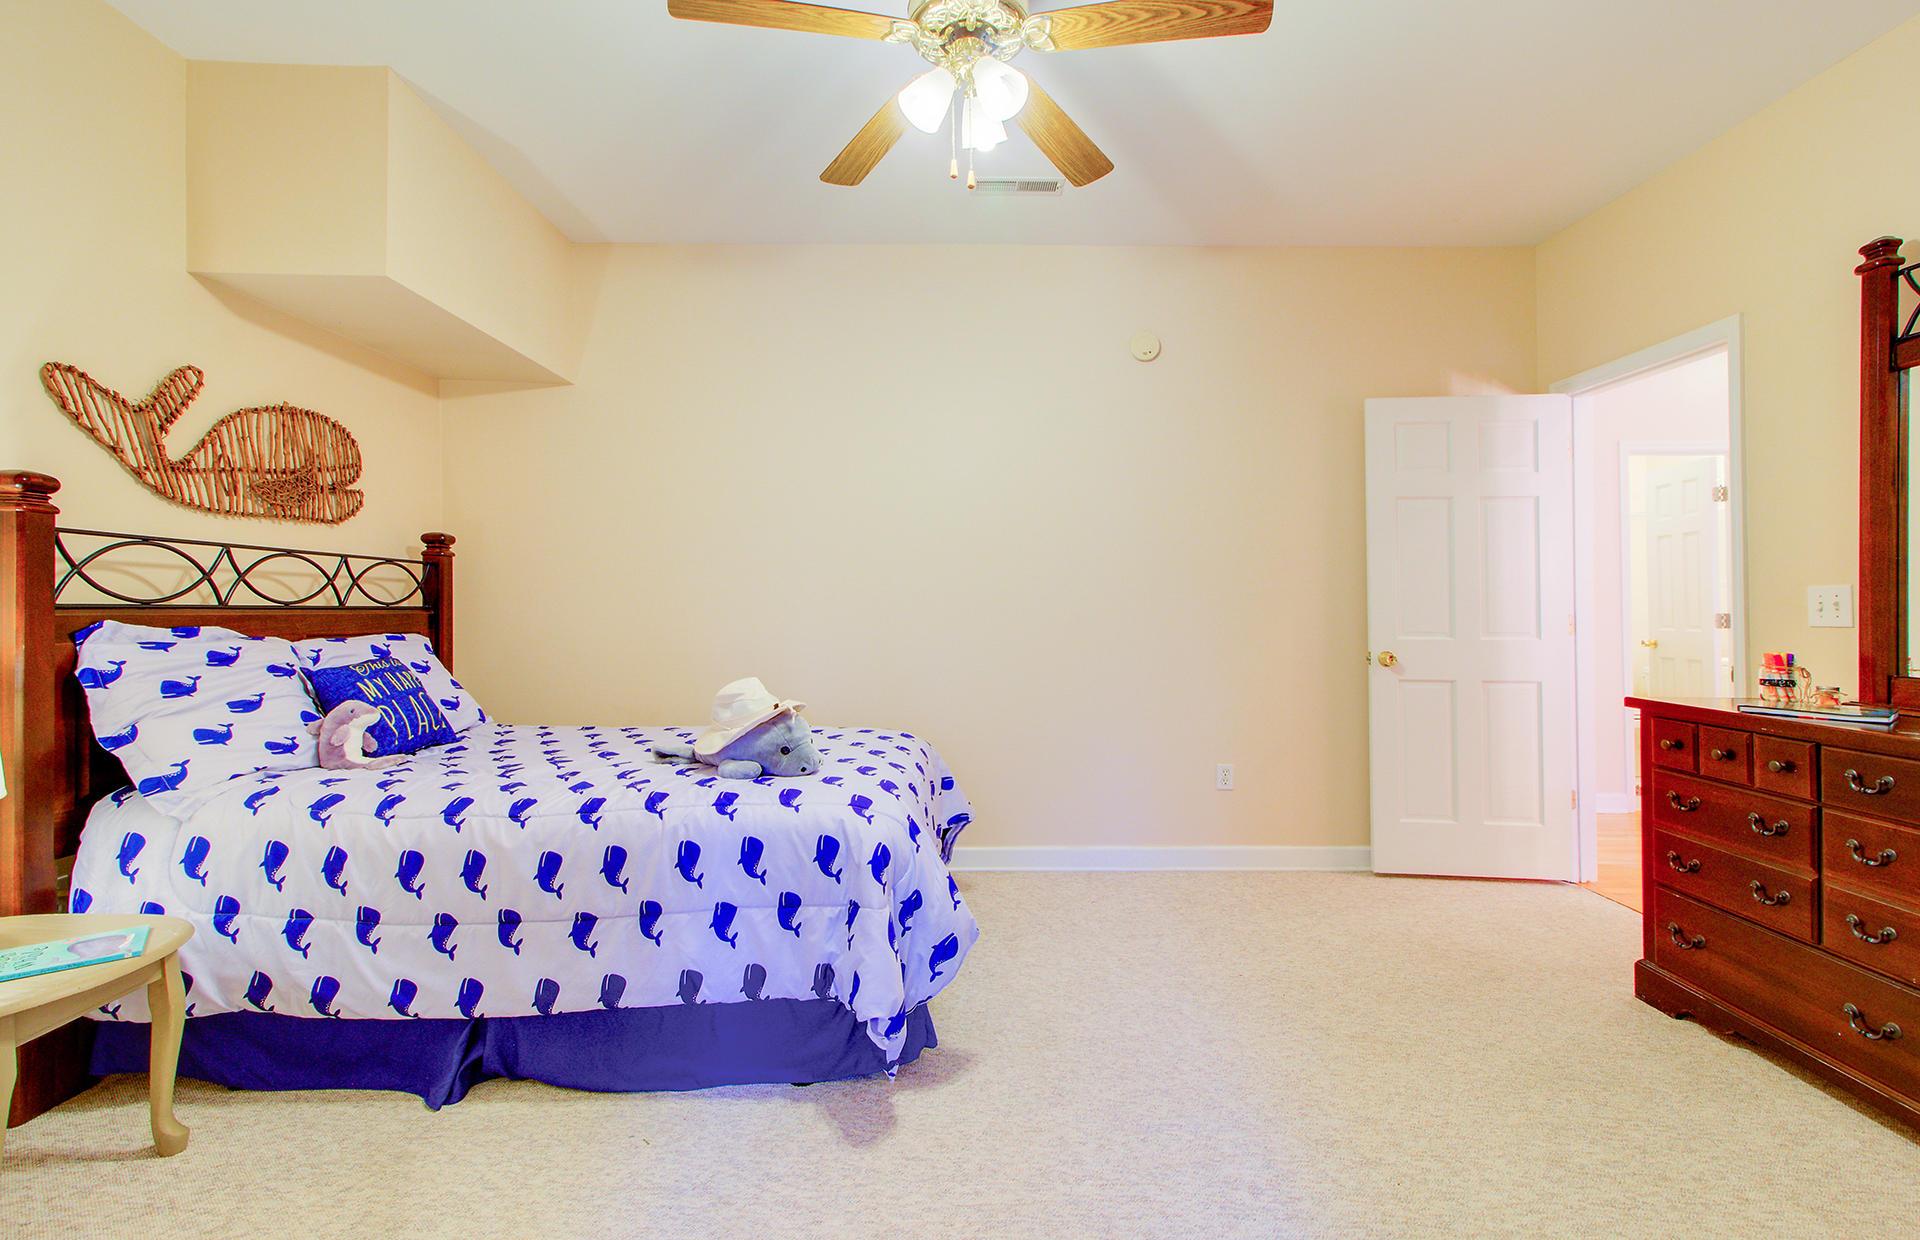 Bakers Landing Homes For Sale - 105 River Oak, North Charleston, SC - 7